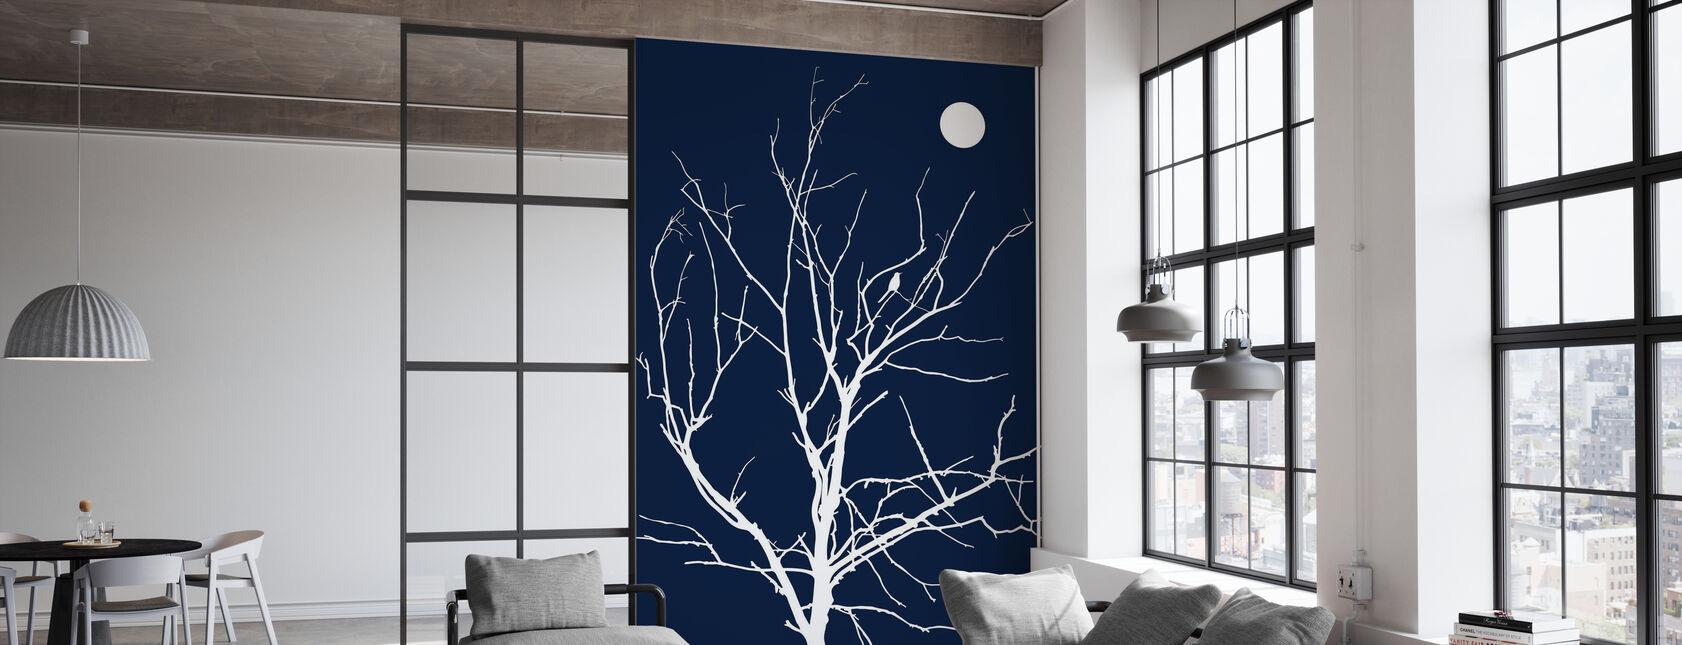 Lonely Bird Night Moon - Wallpaper - Office